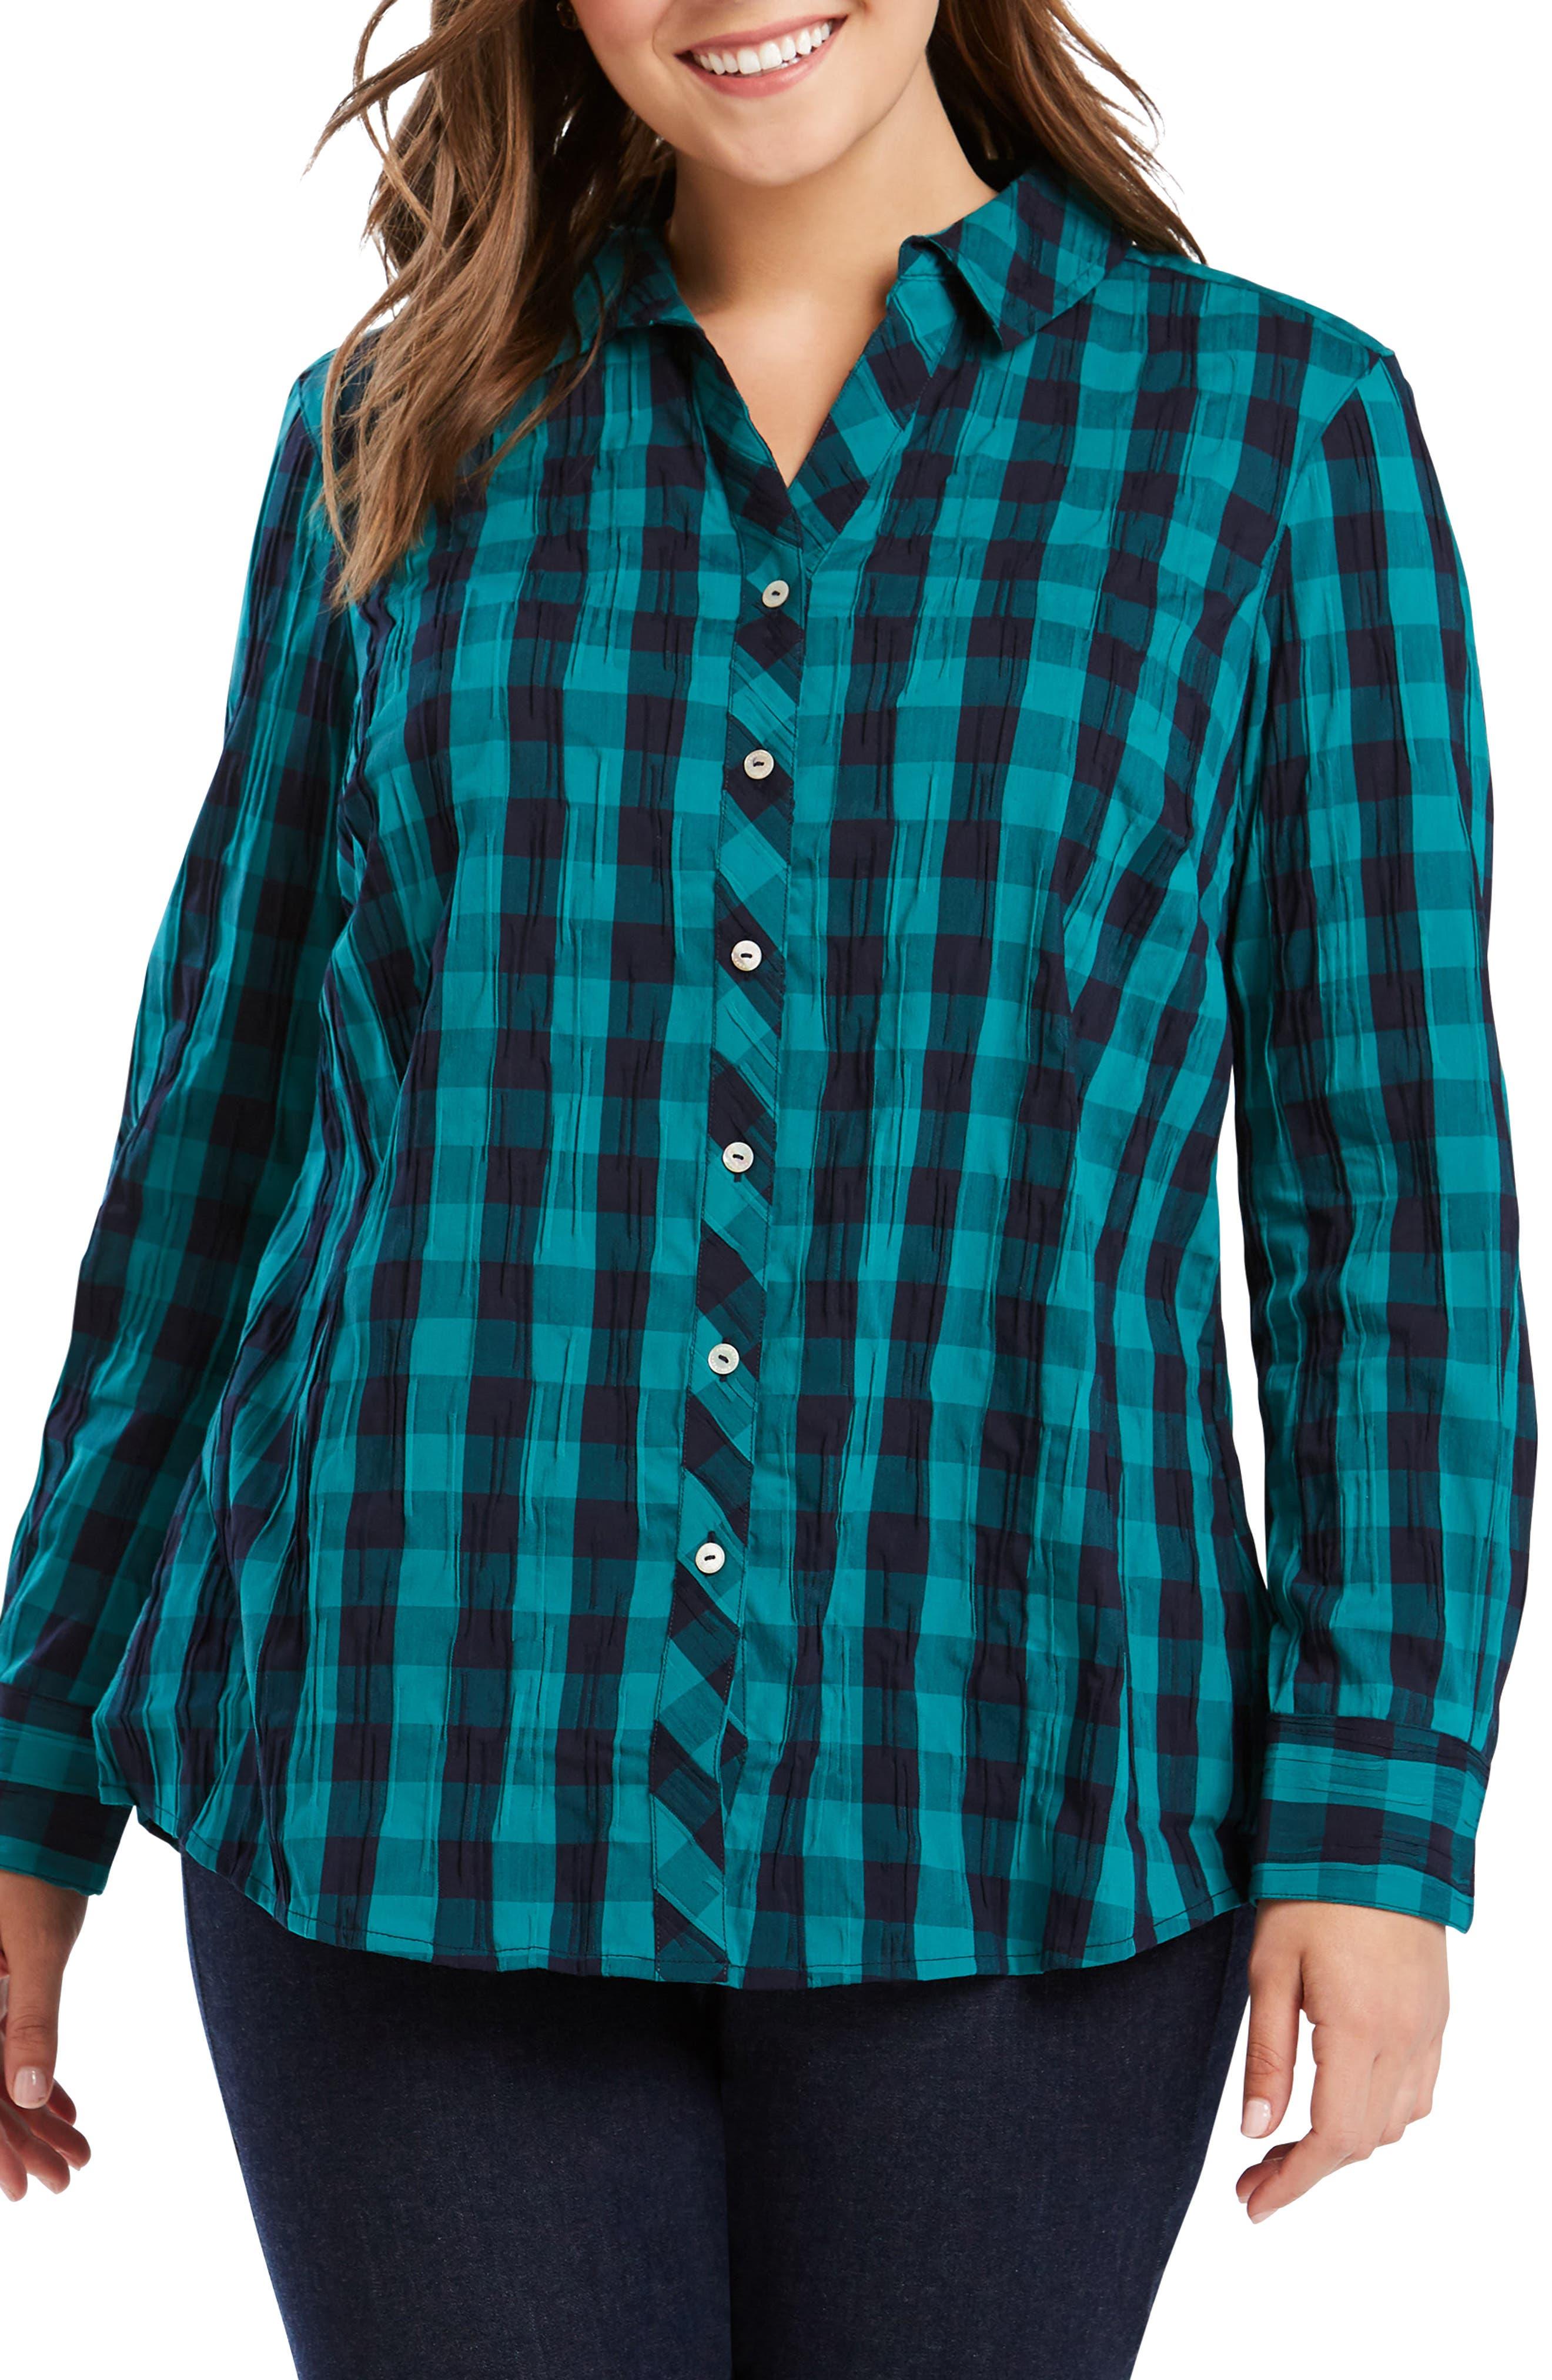 Mary Buffalo Check Crinkle Shirt, Main, color, EMERALD CUT